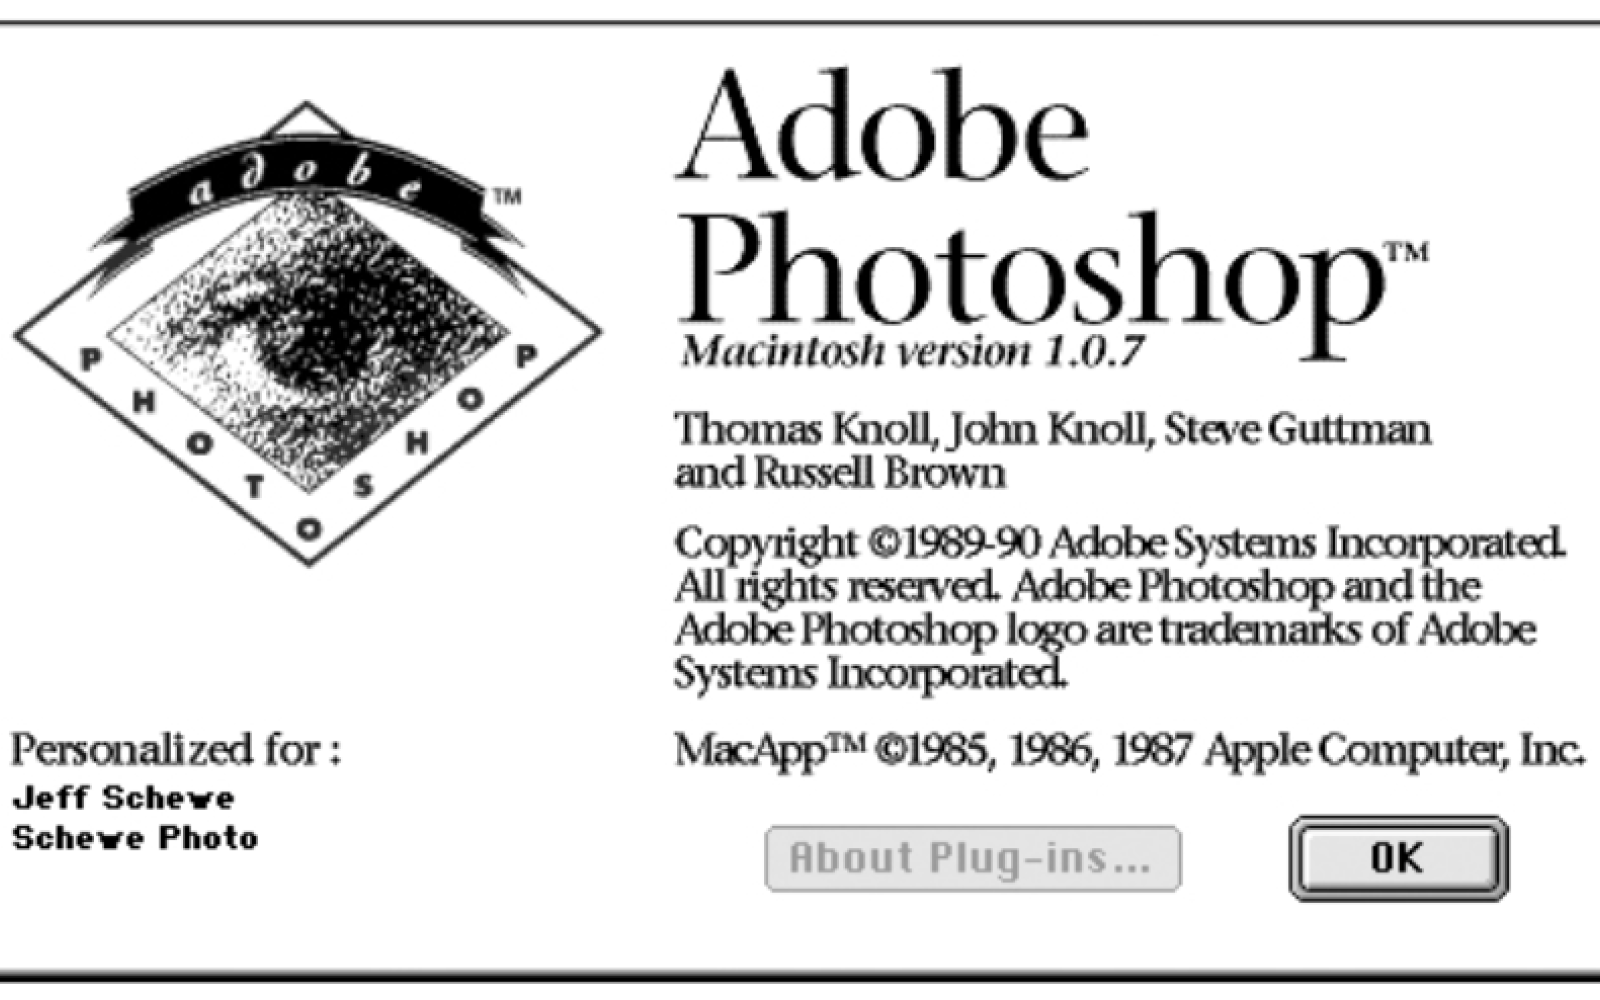 Adobe Photoshop Version 1